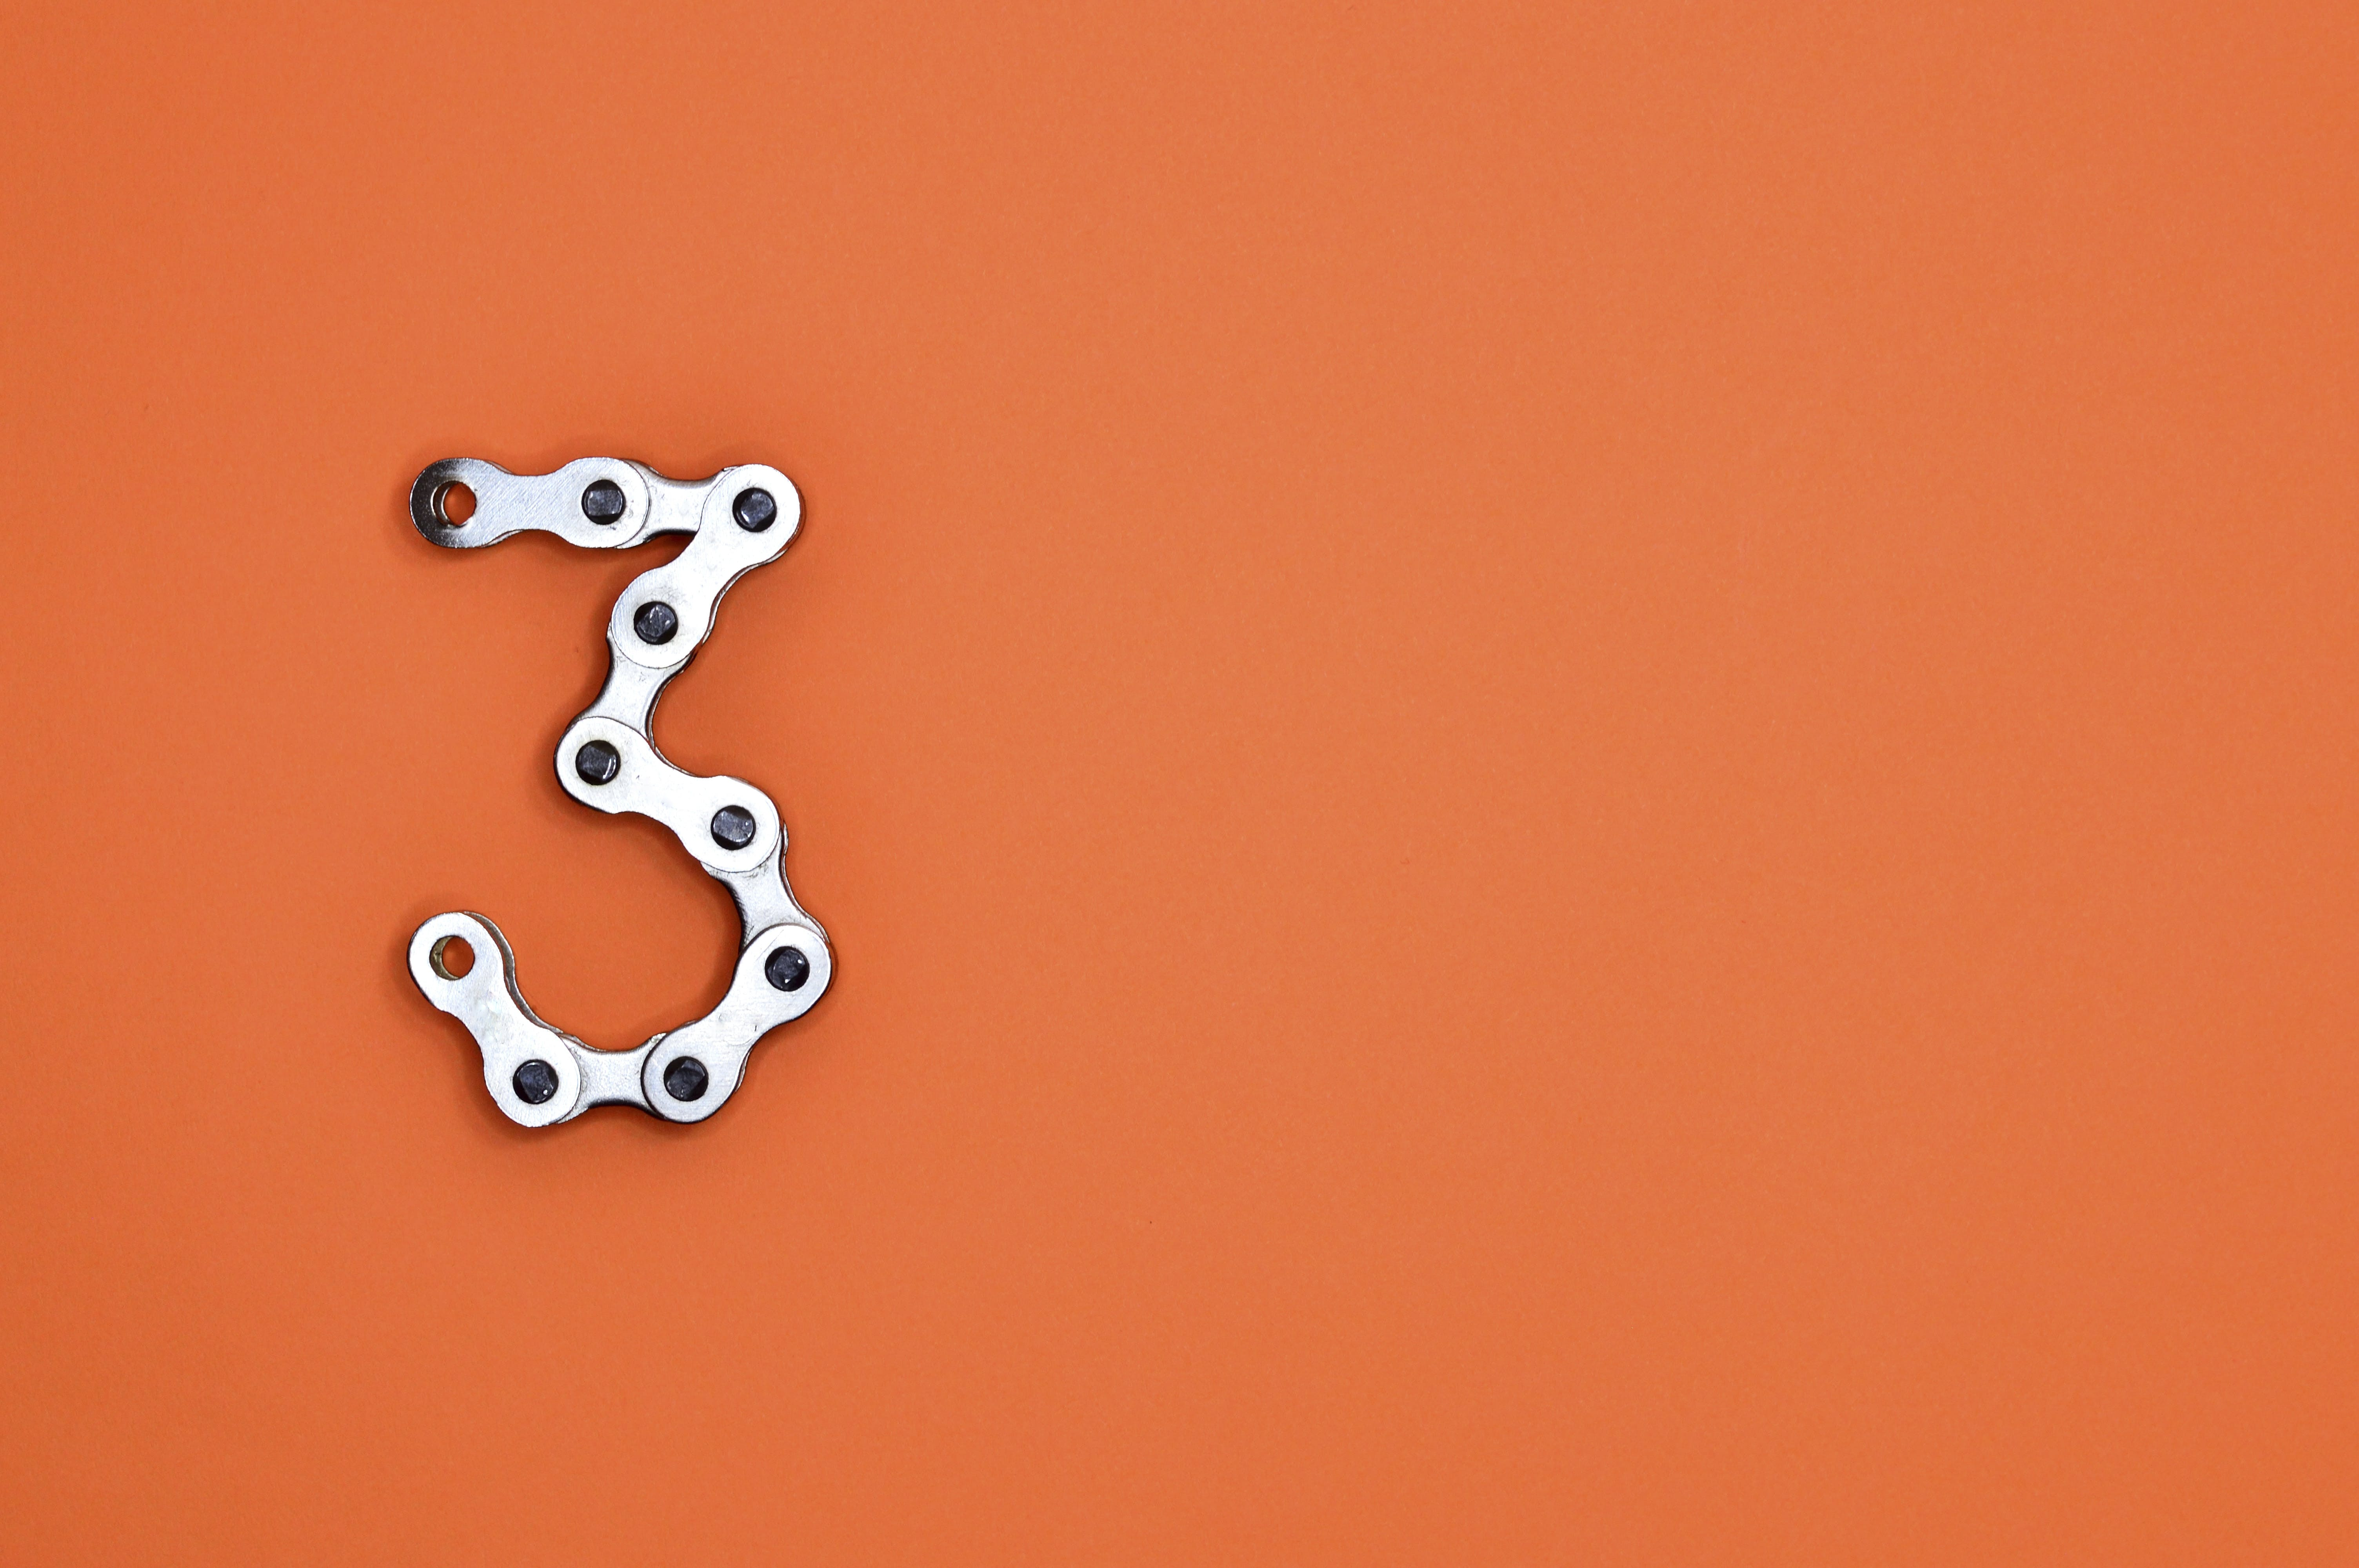 Grey 3 Chain